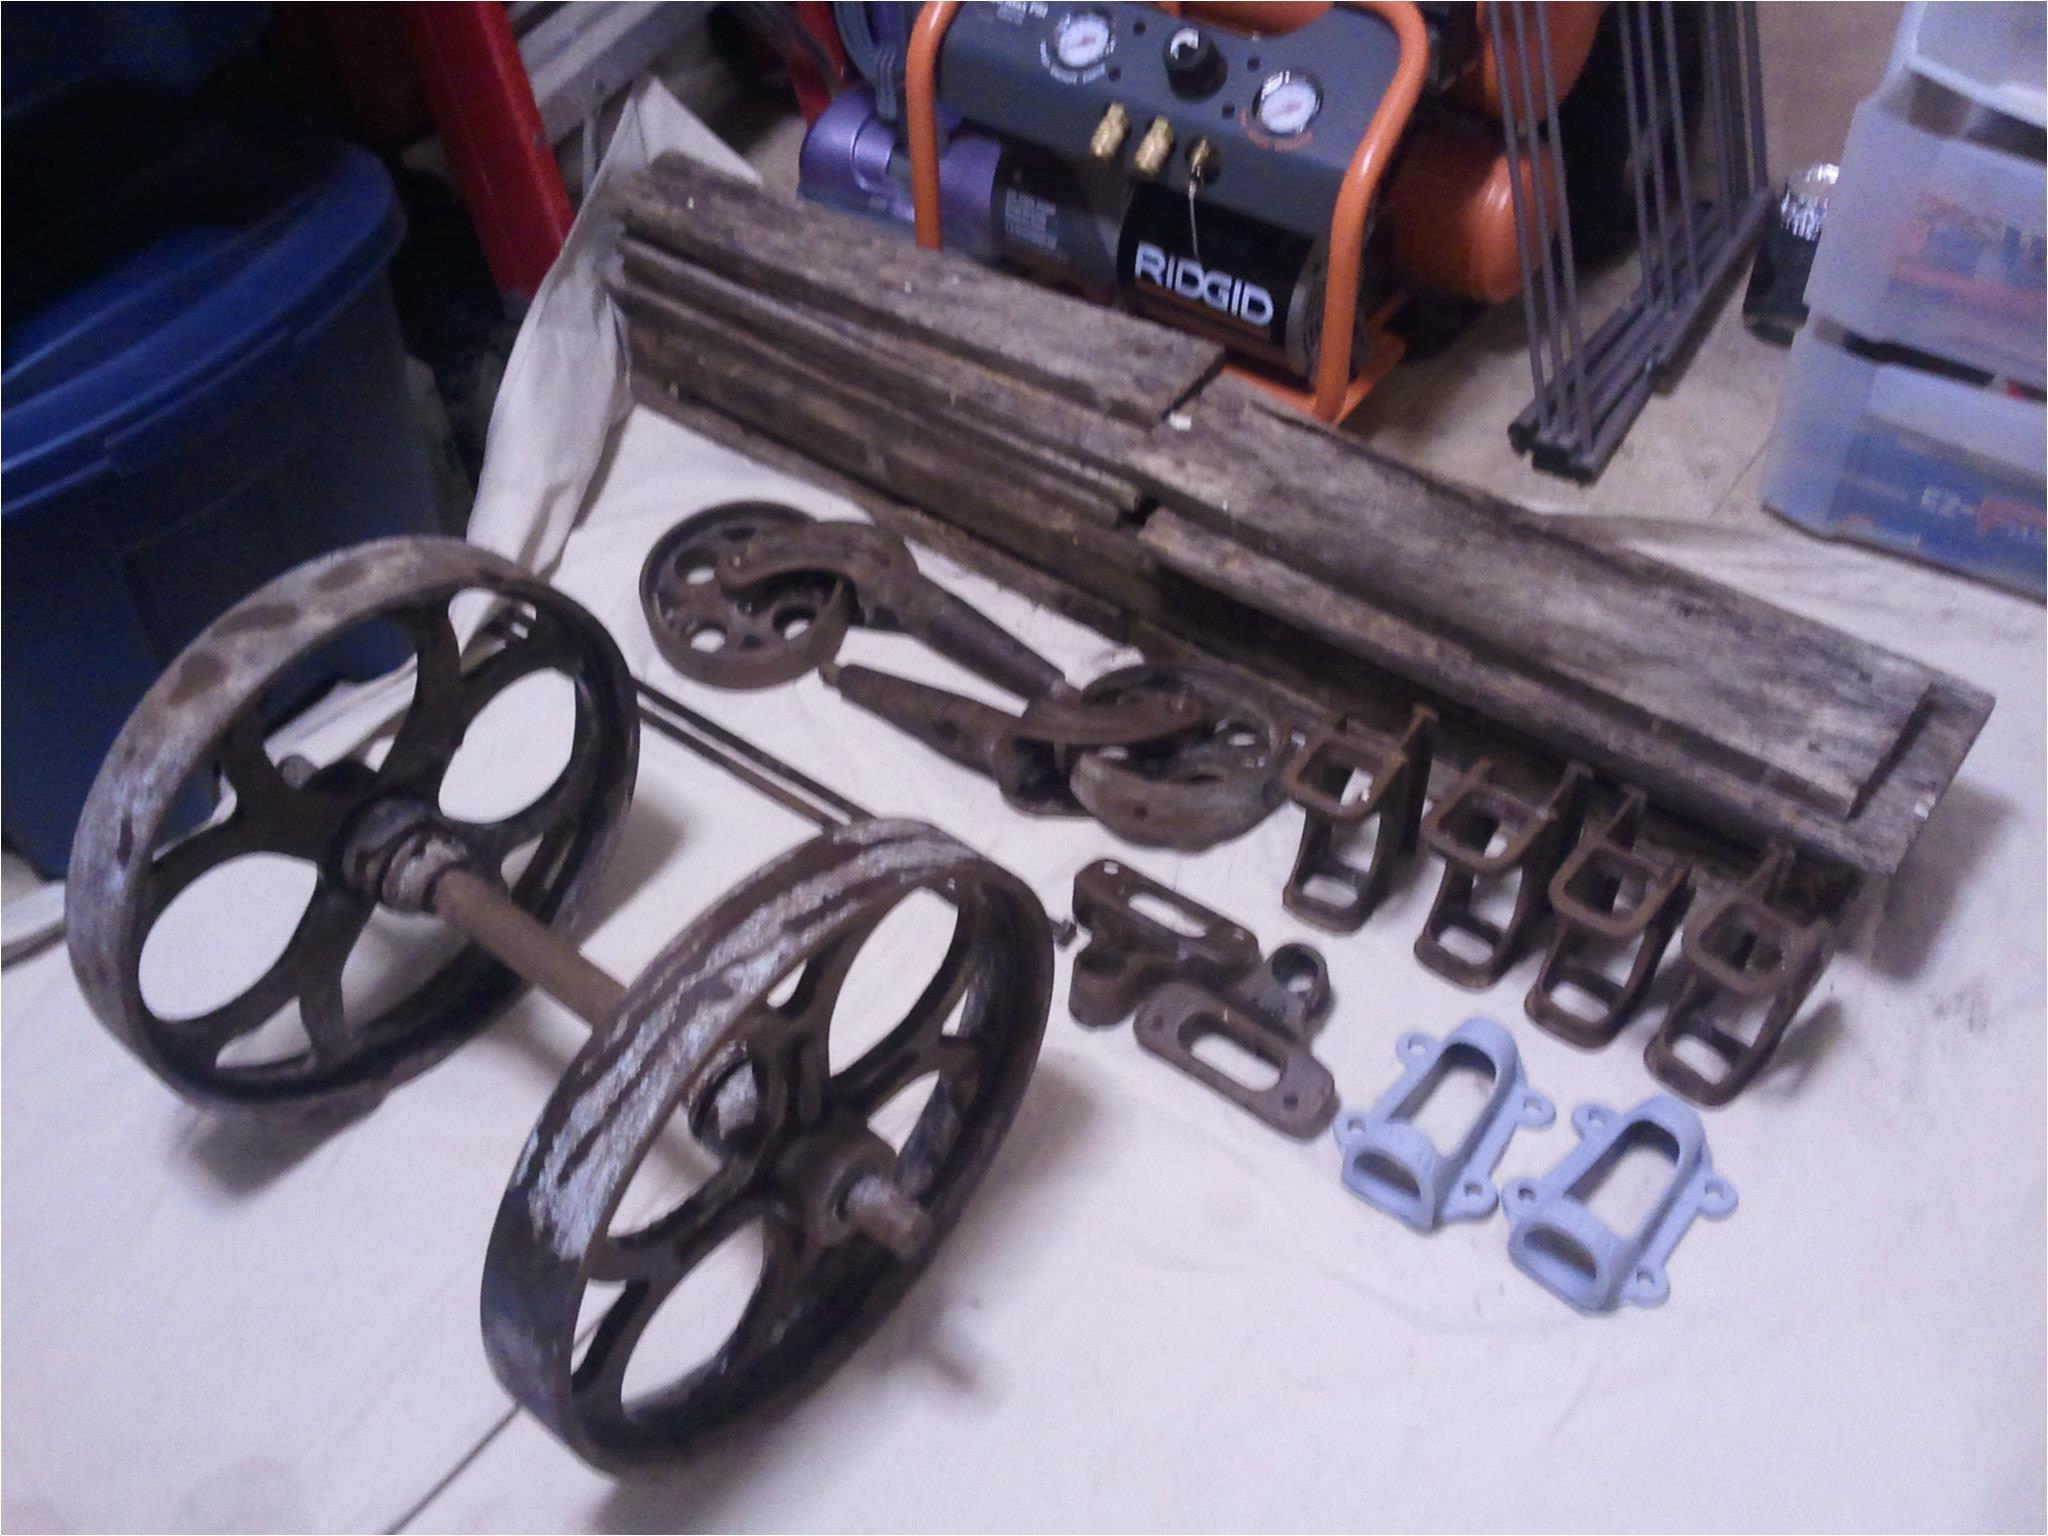 entire cart broken down all pieces organized